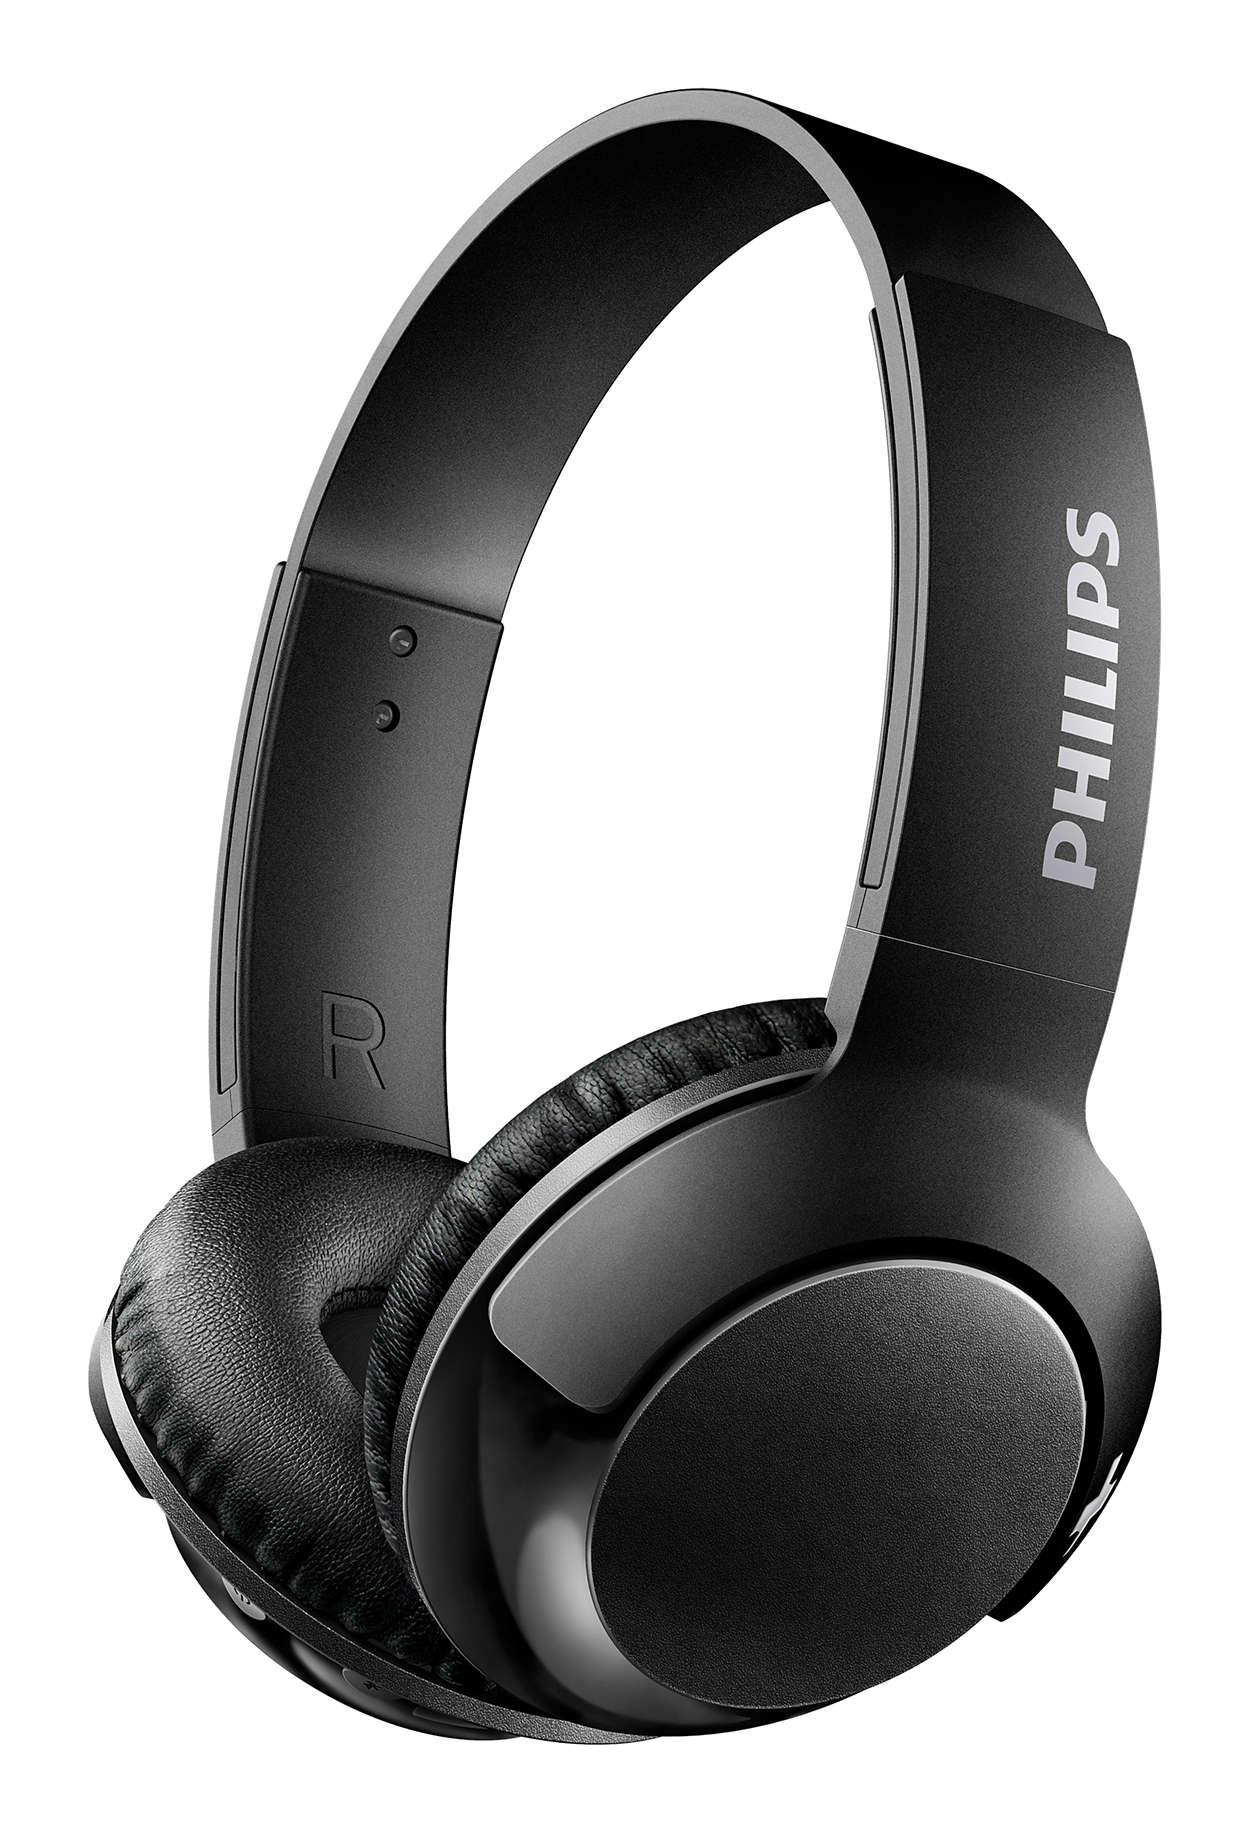 Philips SHB3075 Wireless On-Ear Headphones - Black/White/Blue/Red - £49.99 @ Argos